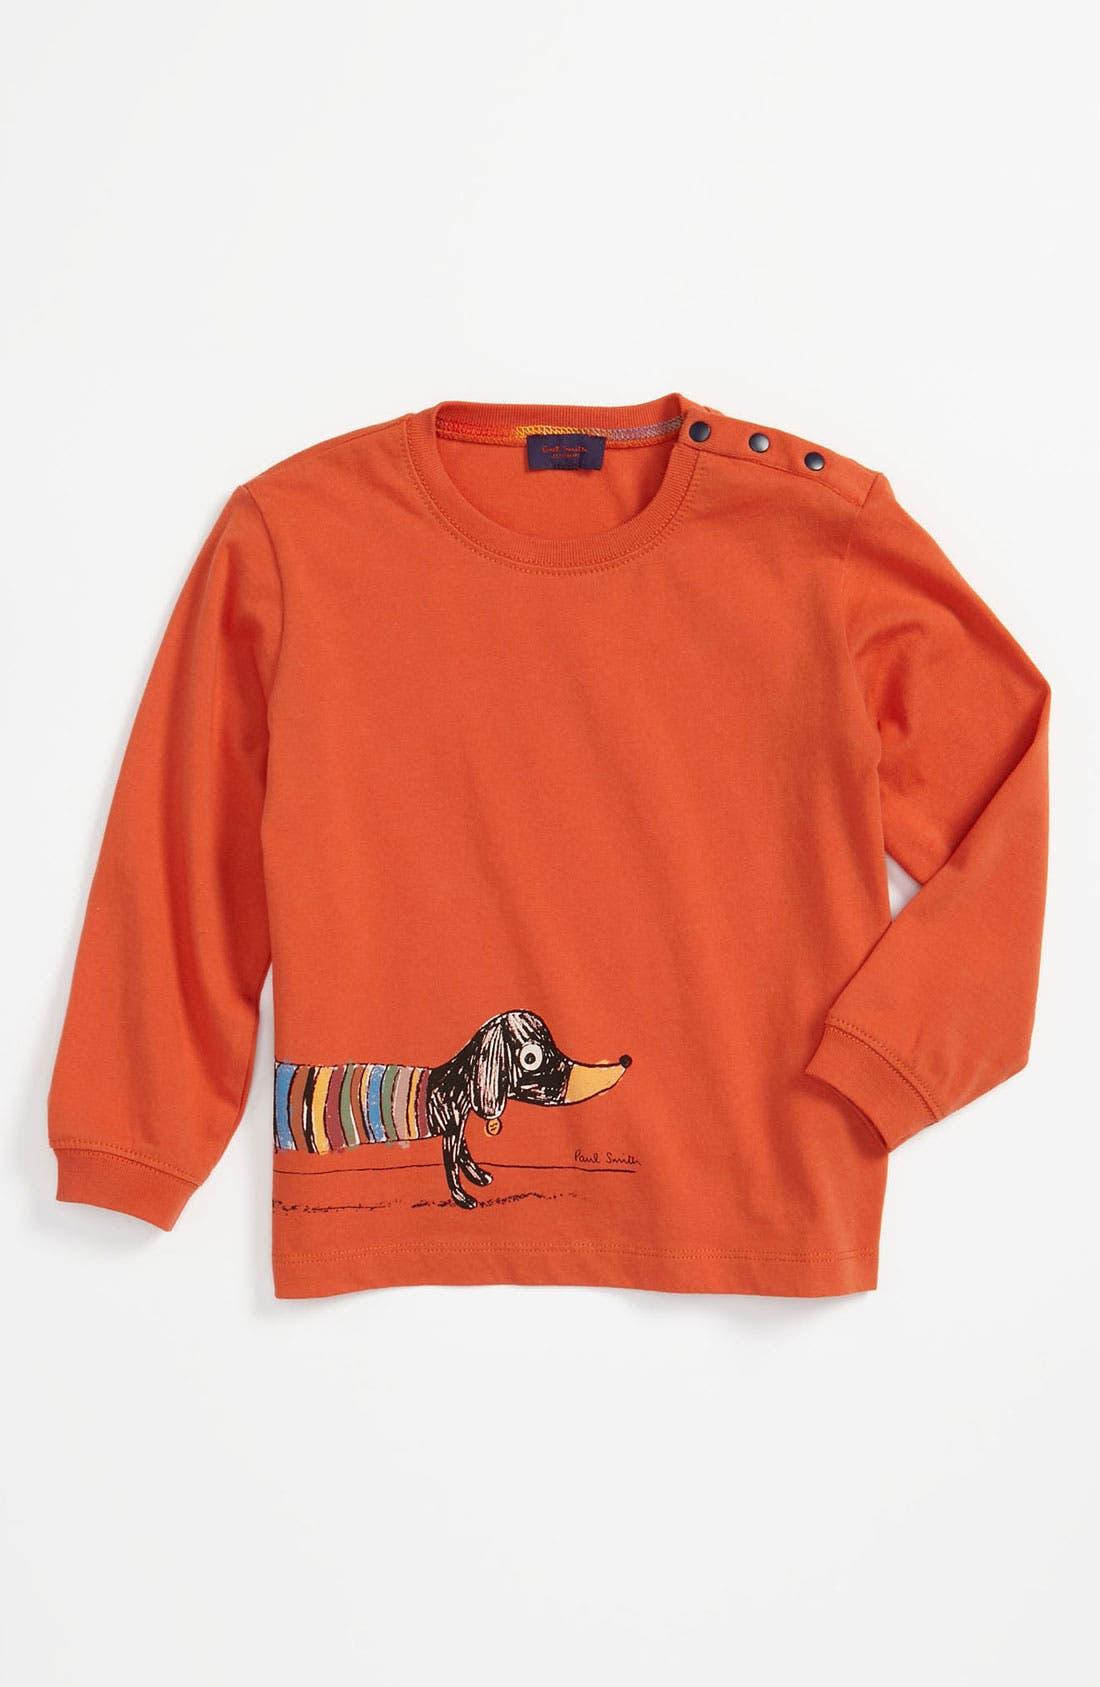 Main Image - Paul Smith Junior 'Camillo' T-Shirt (Infant)